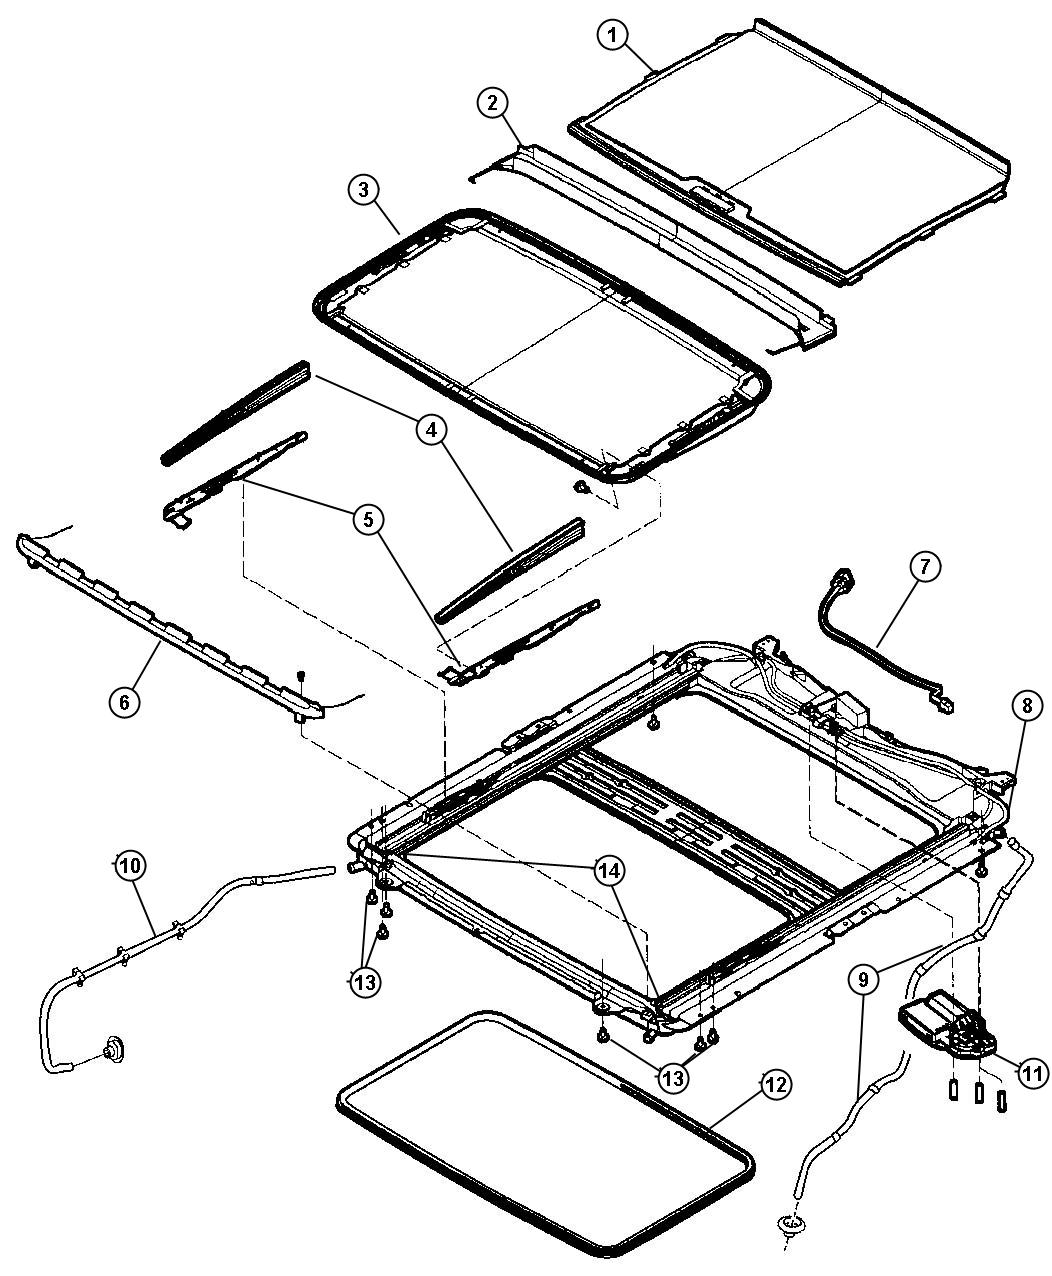 hight resolution of factory ford sunroof parts wiring diagram fuse box 2019 hyundai veracruz 2007 hyundai veracruz inside